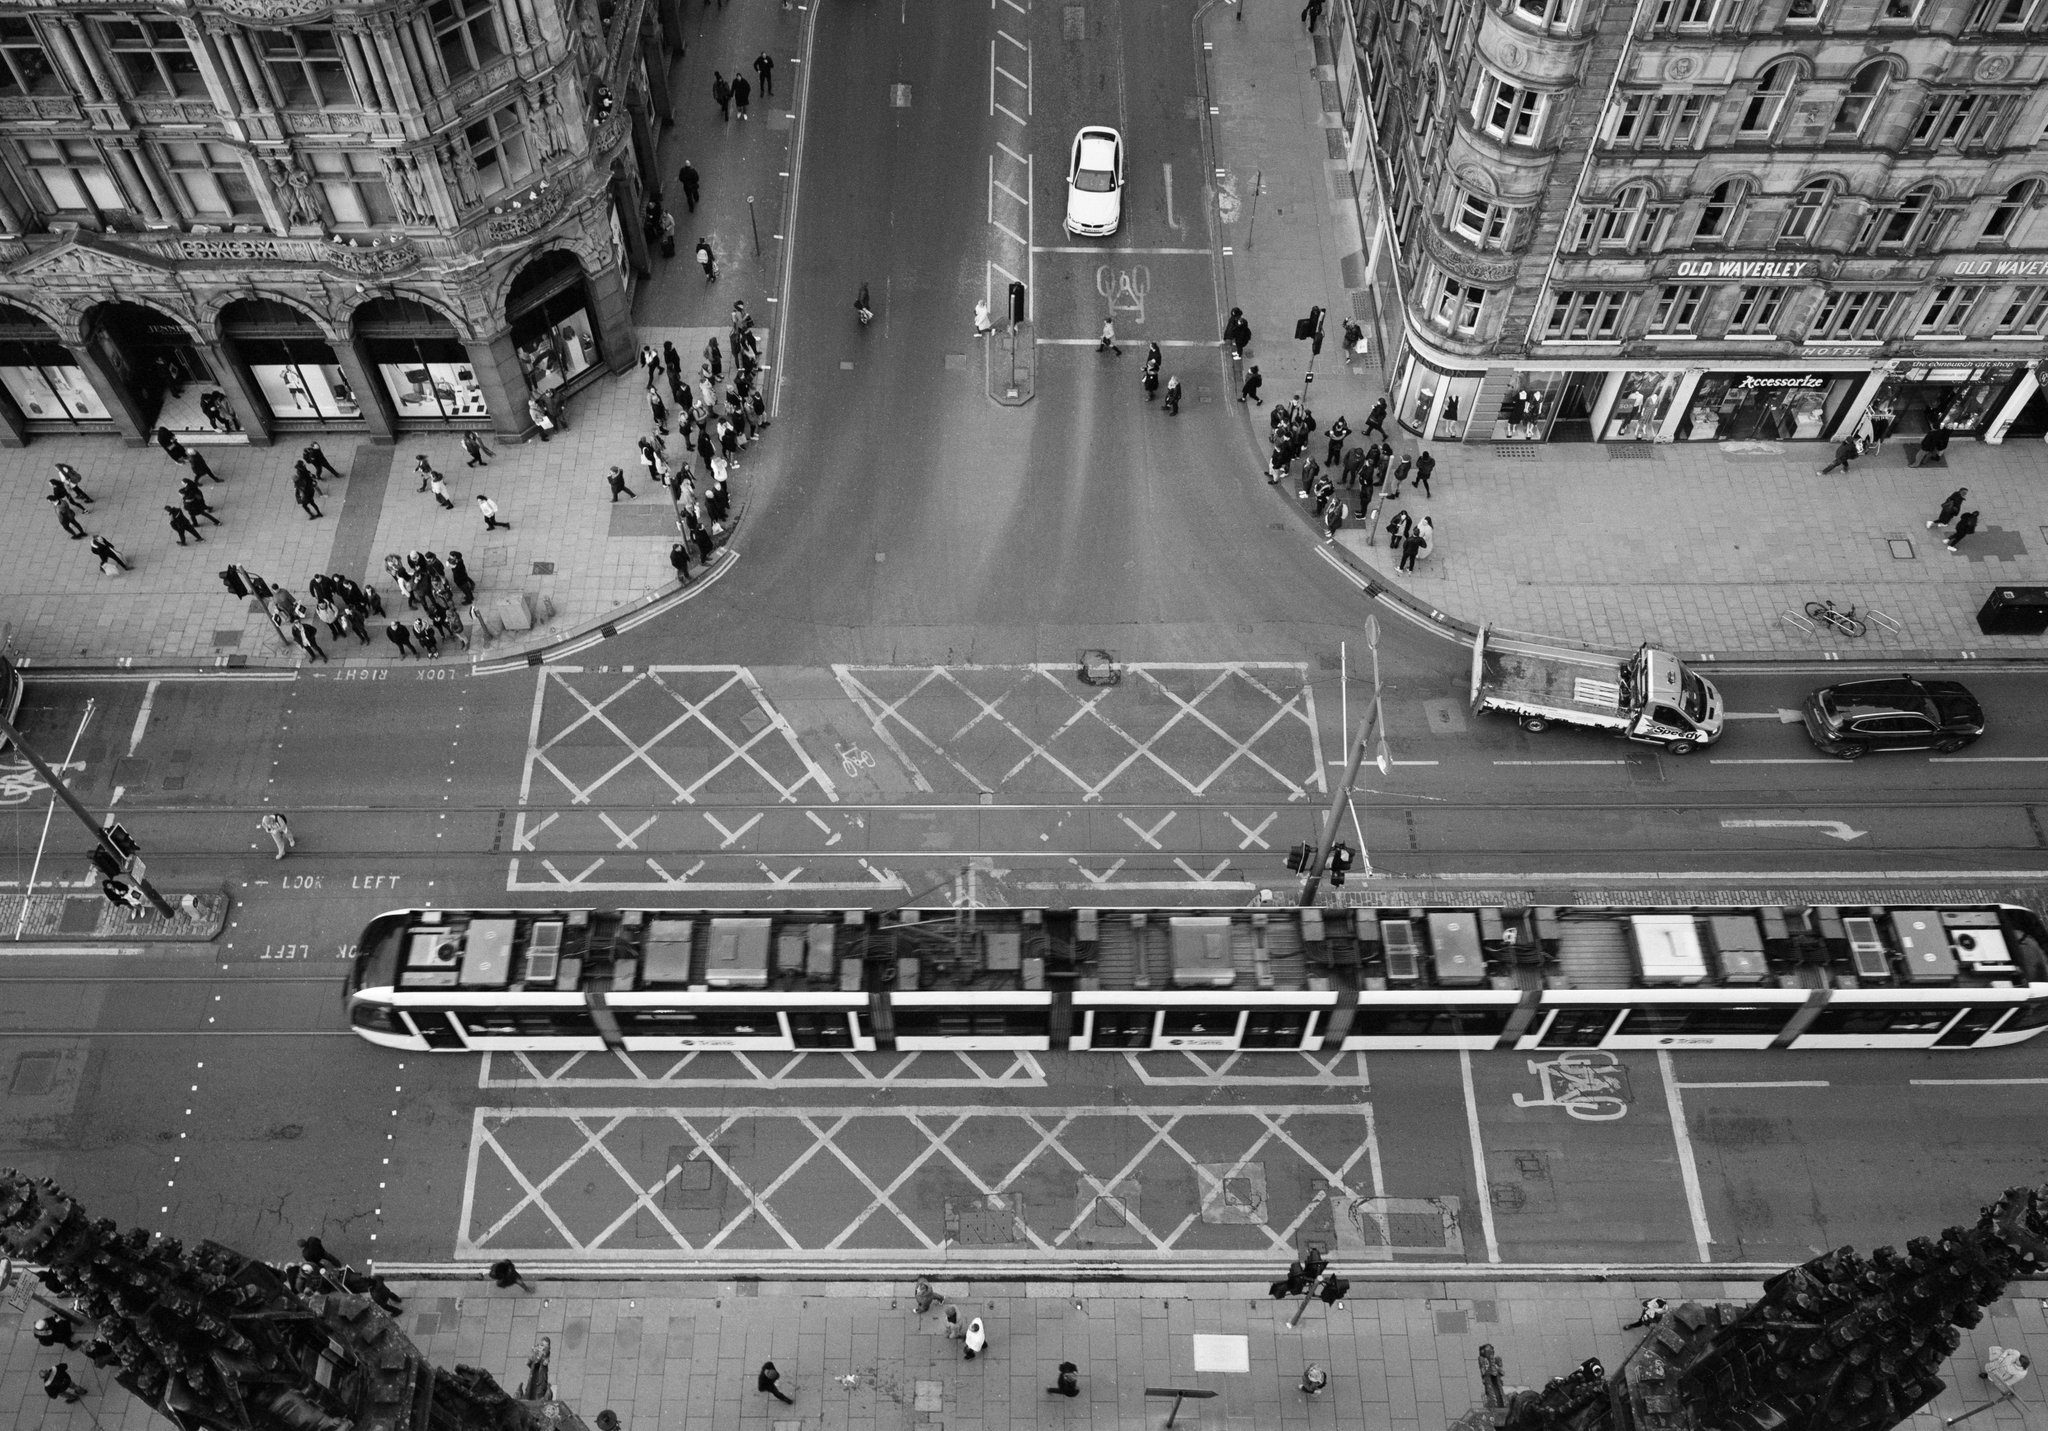 @BNRYNLDS · 19 Aug It loves the city. #ilfordphoto #fridayfavourites #shotonfp4